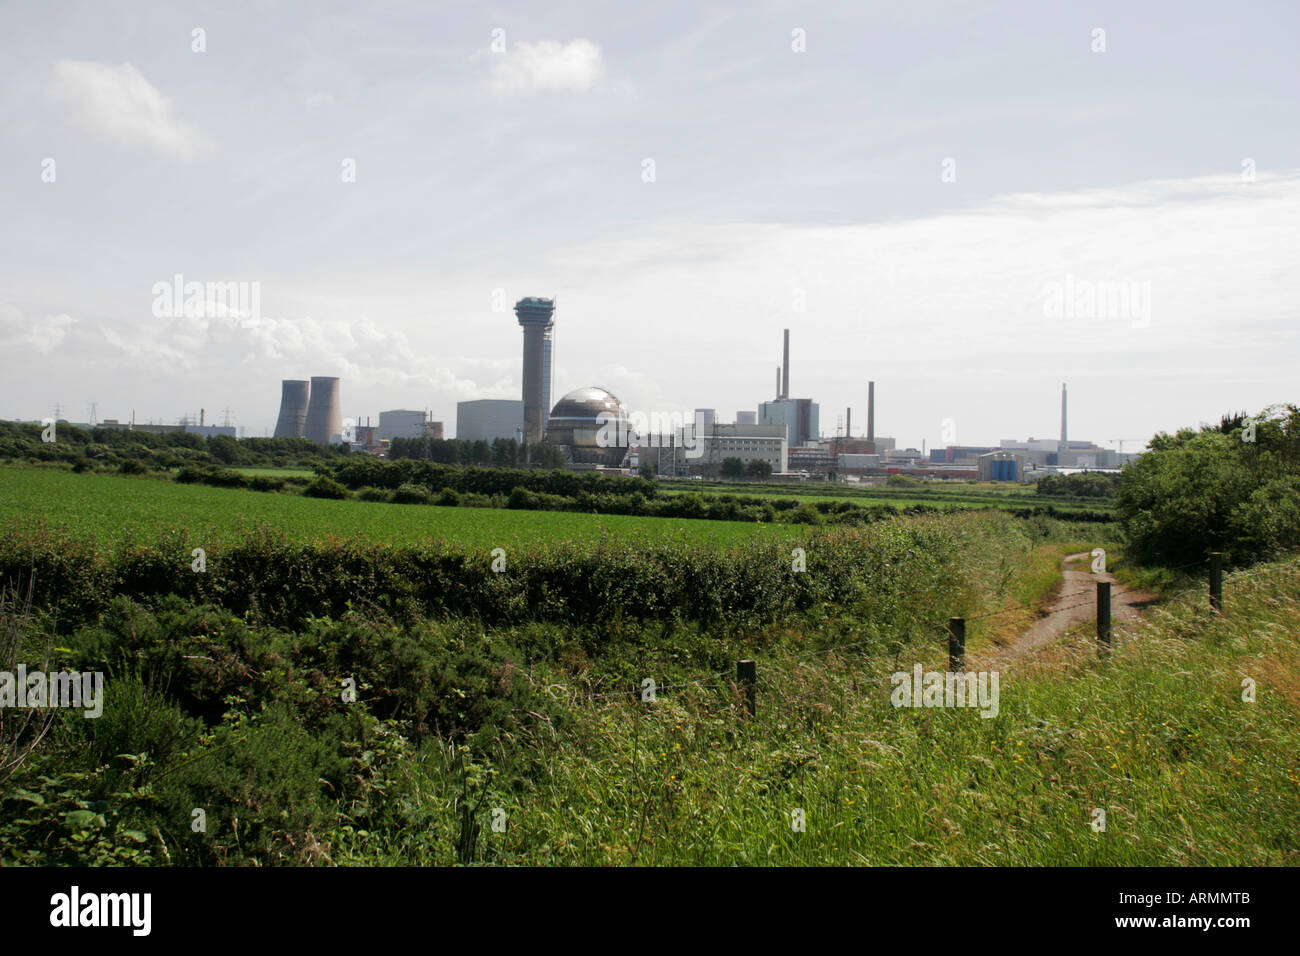 Sellafield Nuclear Facility - Stock Image